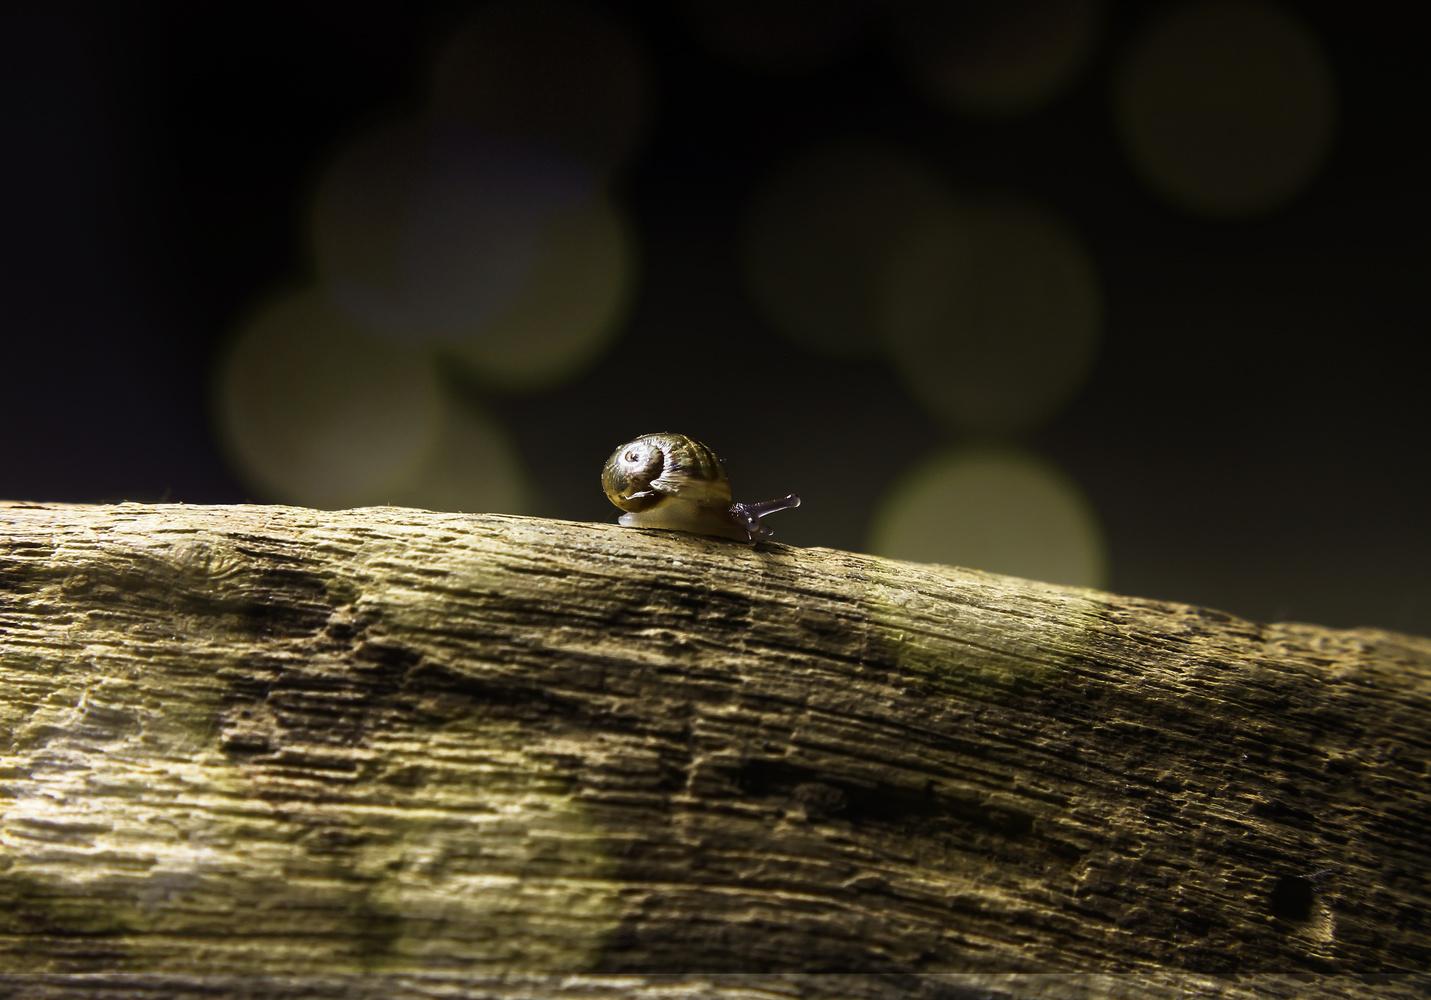 Little Snail by Ricardo Sanchez Ruiz